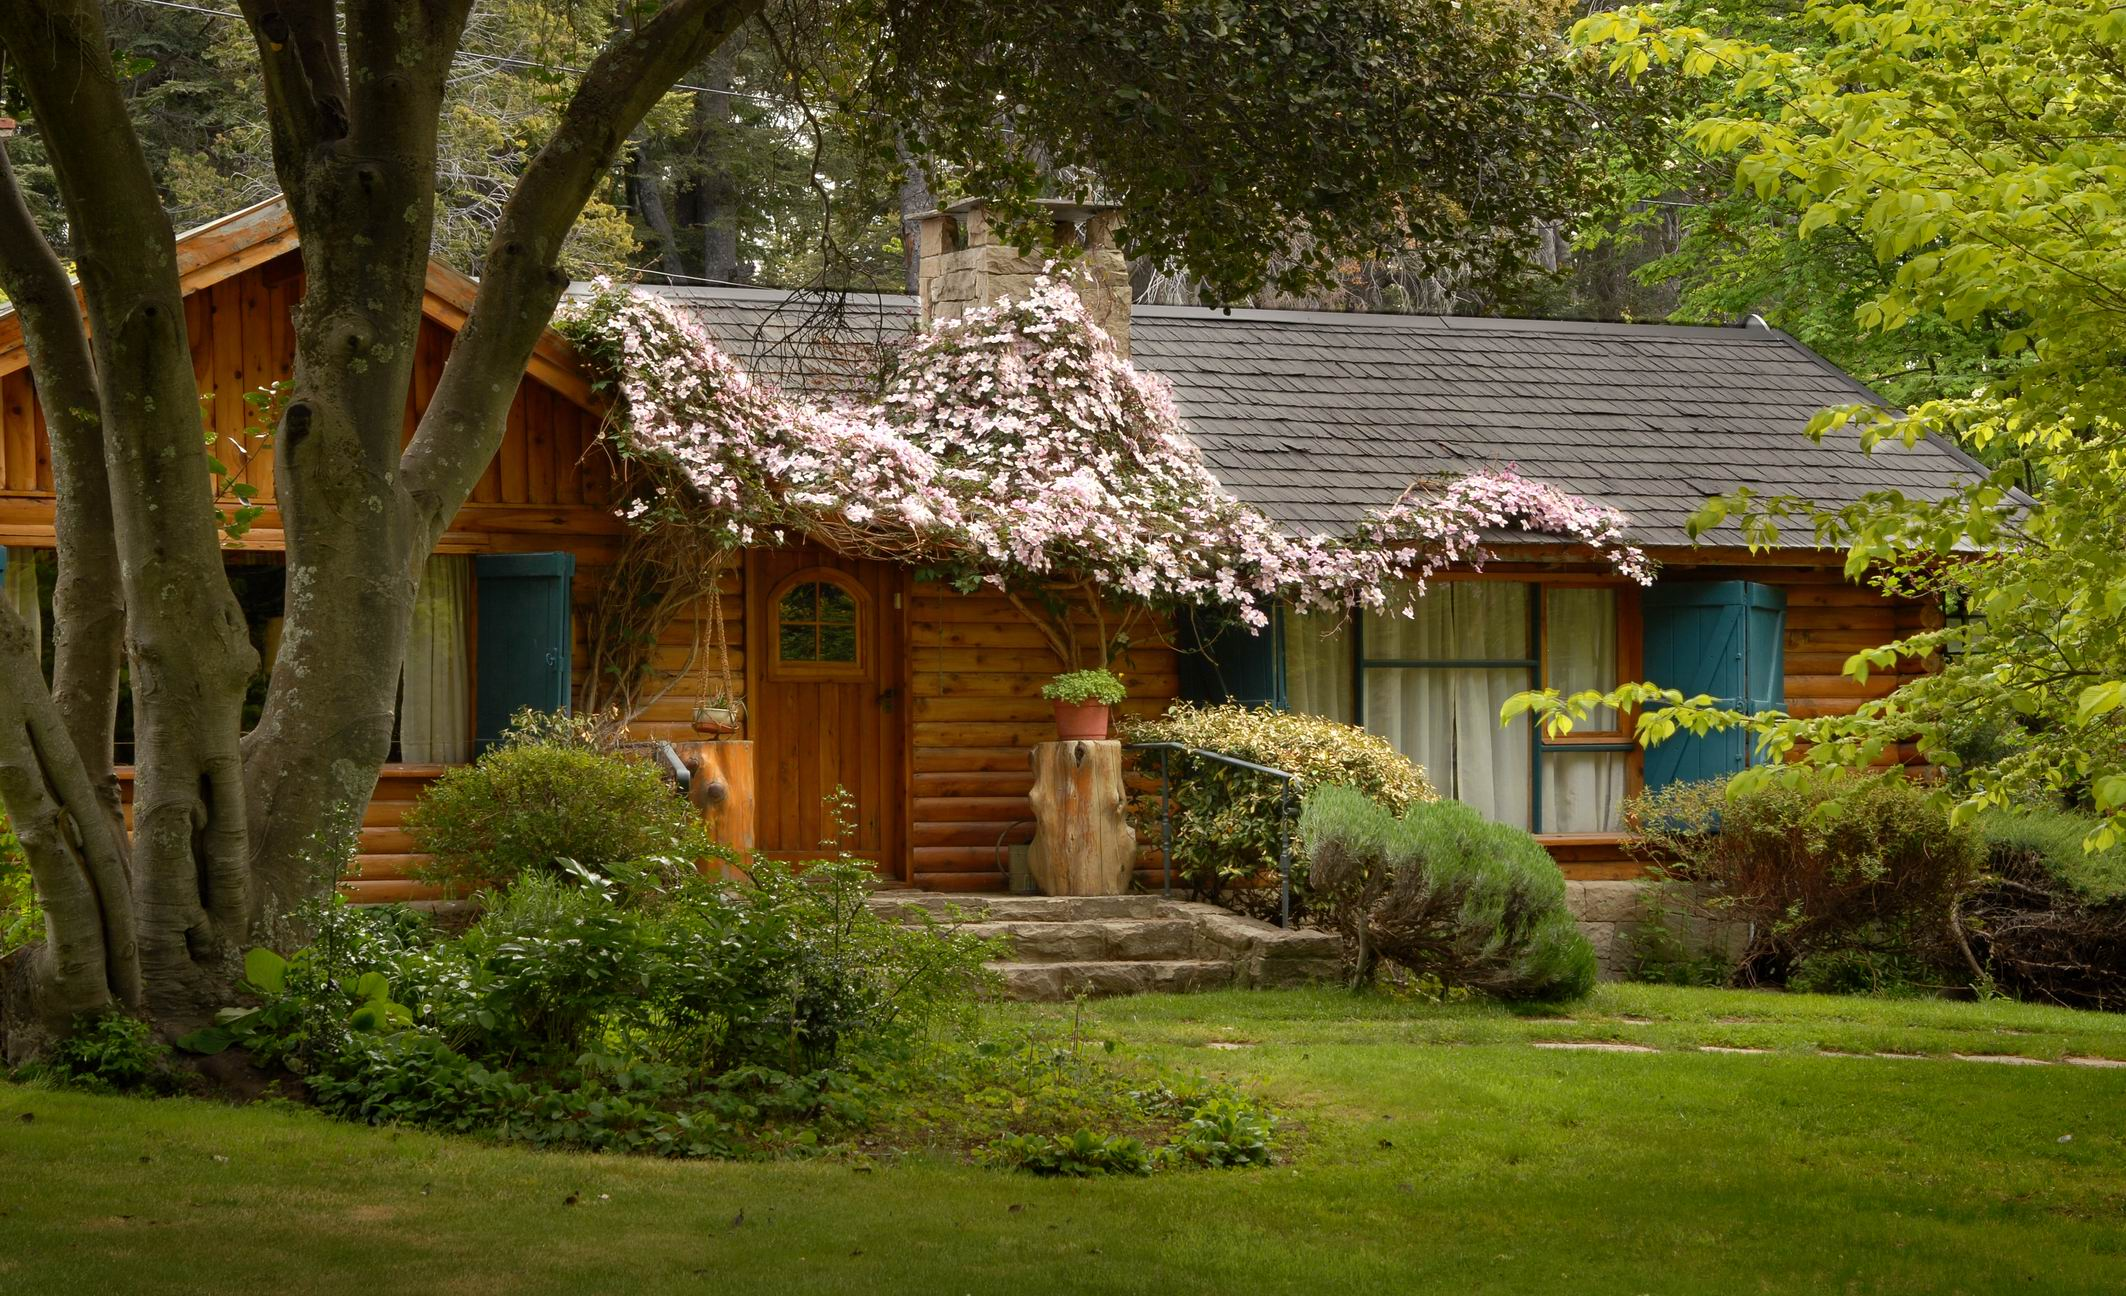 Venda casa de campo bariloche rio negro argentina for Casa argentina